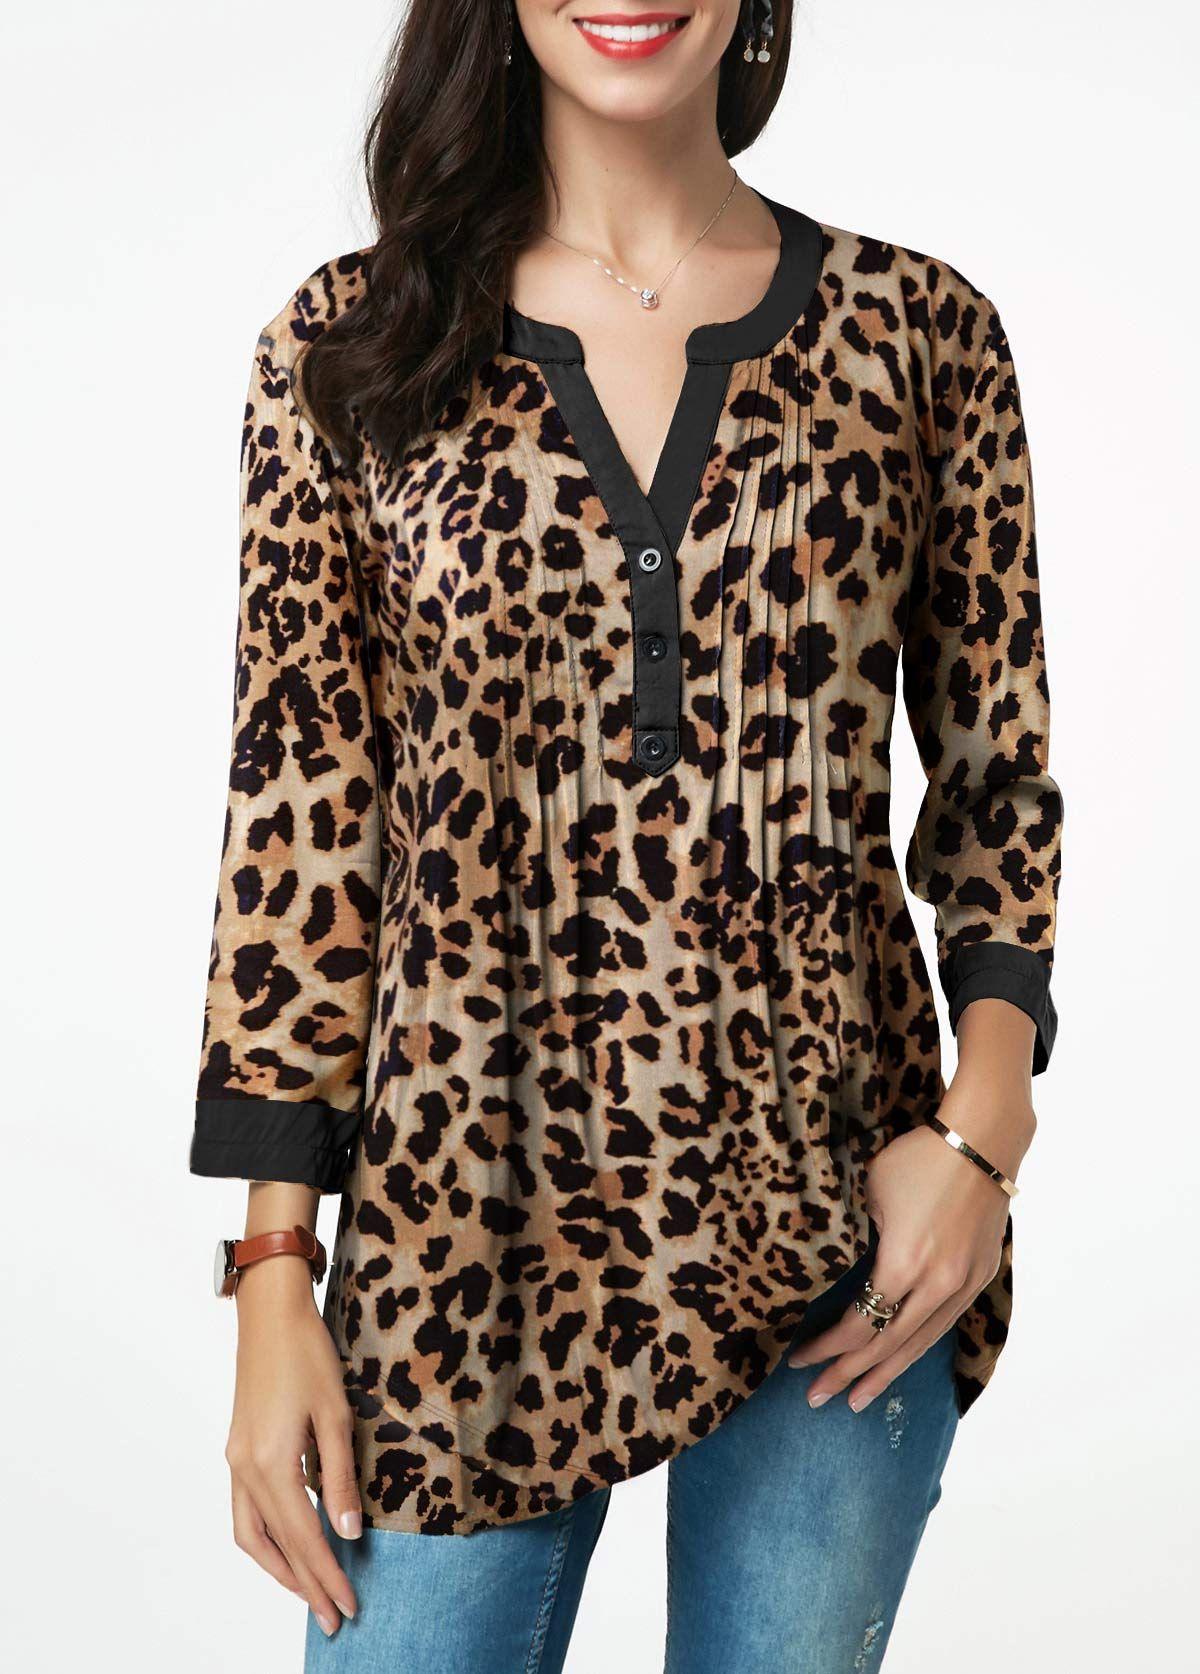 Cinnamou Sudadera Camiseta Mujeres Blusa de Leopardo Mujeres de Manga Larga para Mujer Camiseta T-Shirt Tops